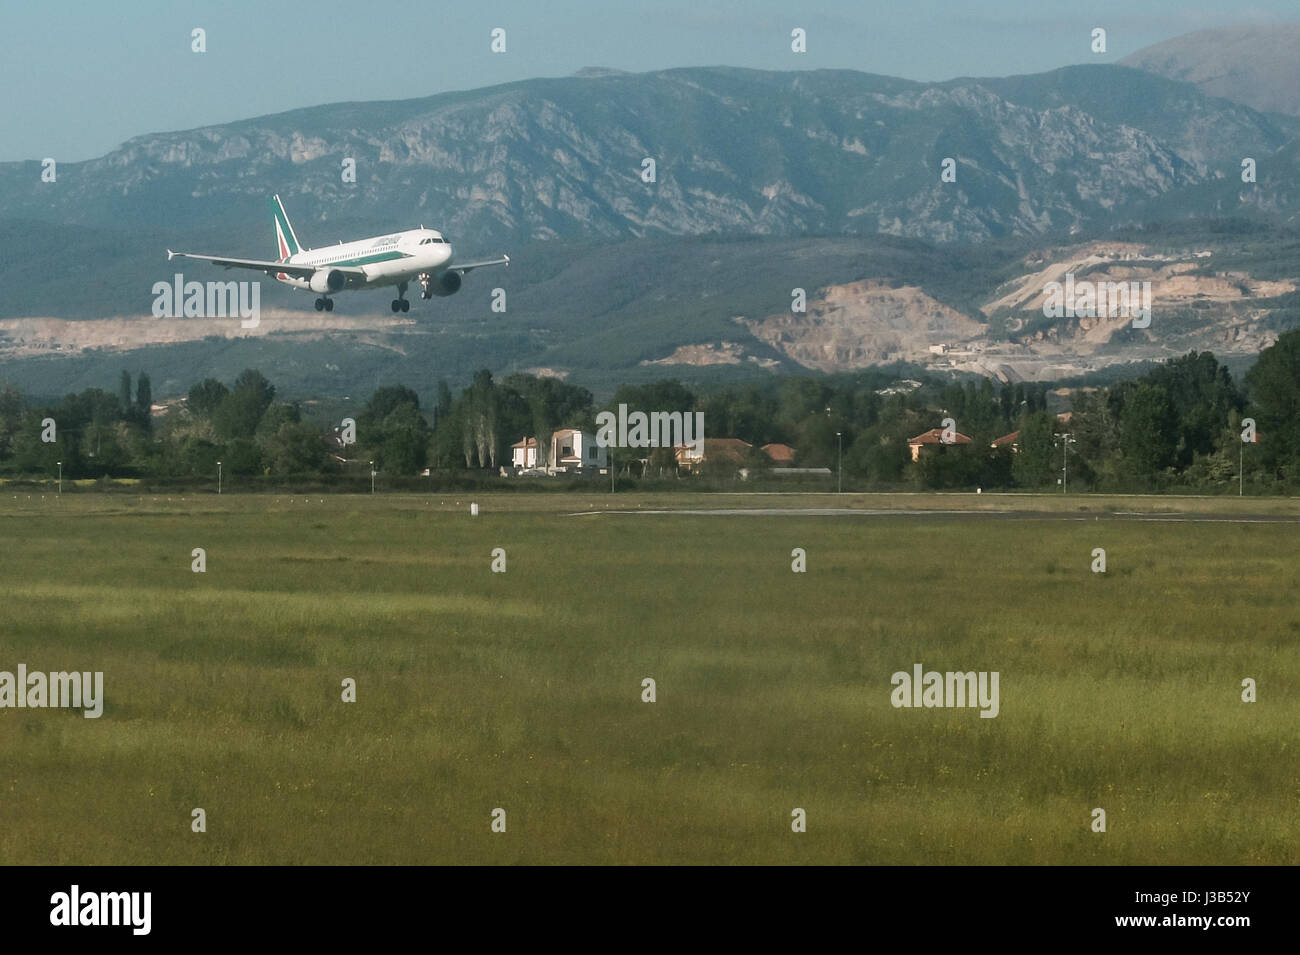 Tirane, Albania. 4th May, 2017. An Alitalia jet approaches for landing at Tirana International Airport in Albania. - Stock Image